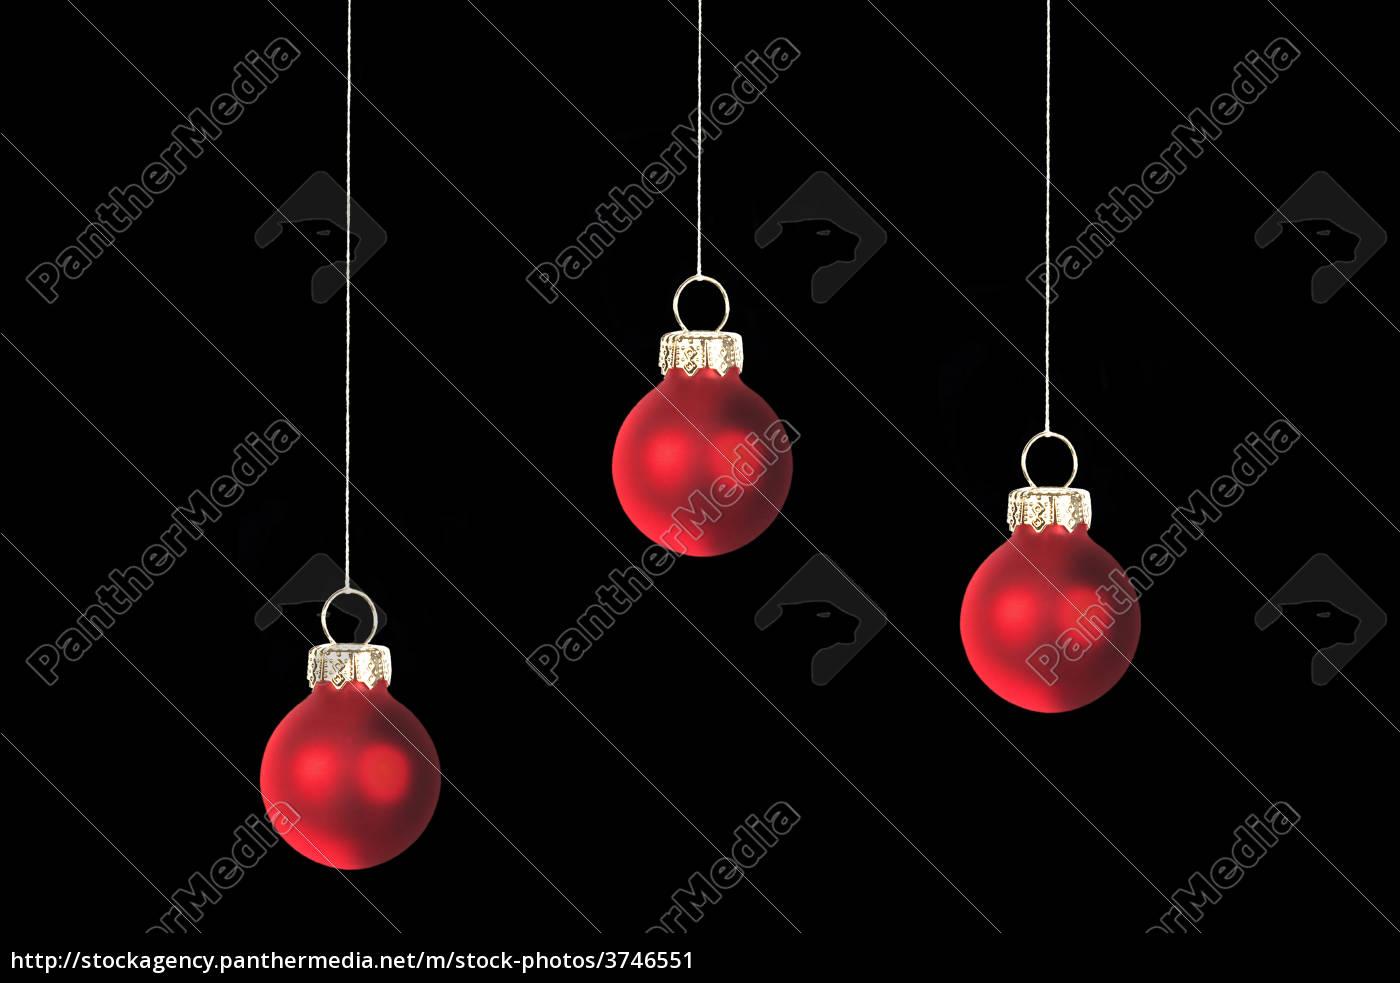 Dunkelrote Christbaumkugeln.Lizenzfreies Bild 3746551 Drei Rote Christbaumkugeln Freigestellt